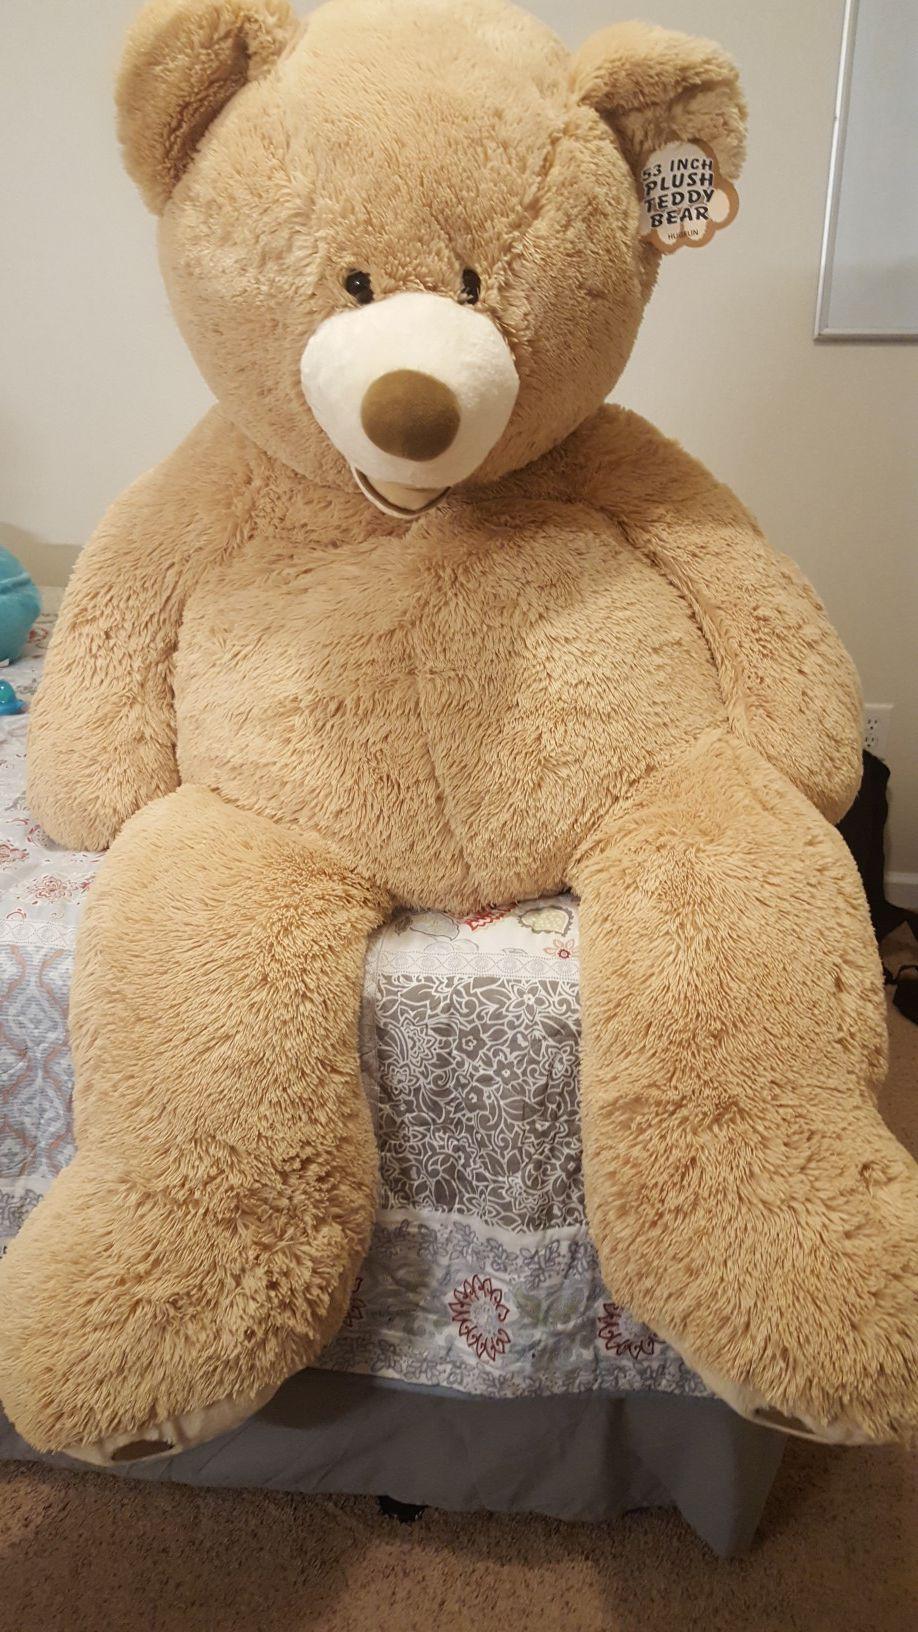 "53"" Teddy bear - Costco Product"